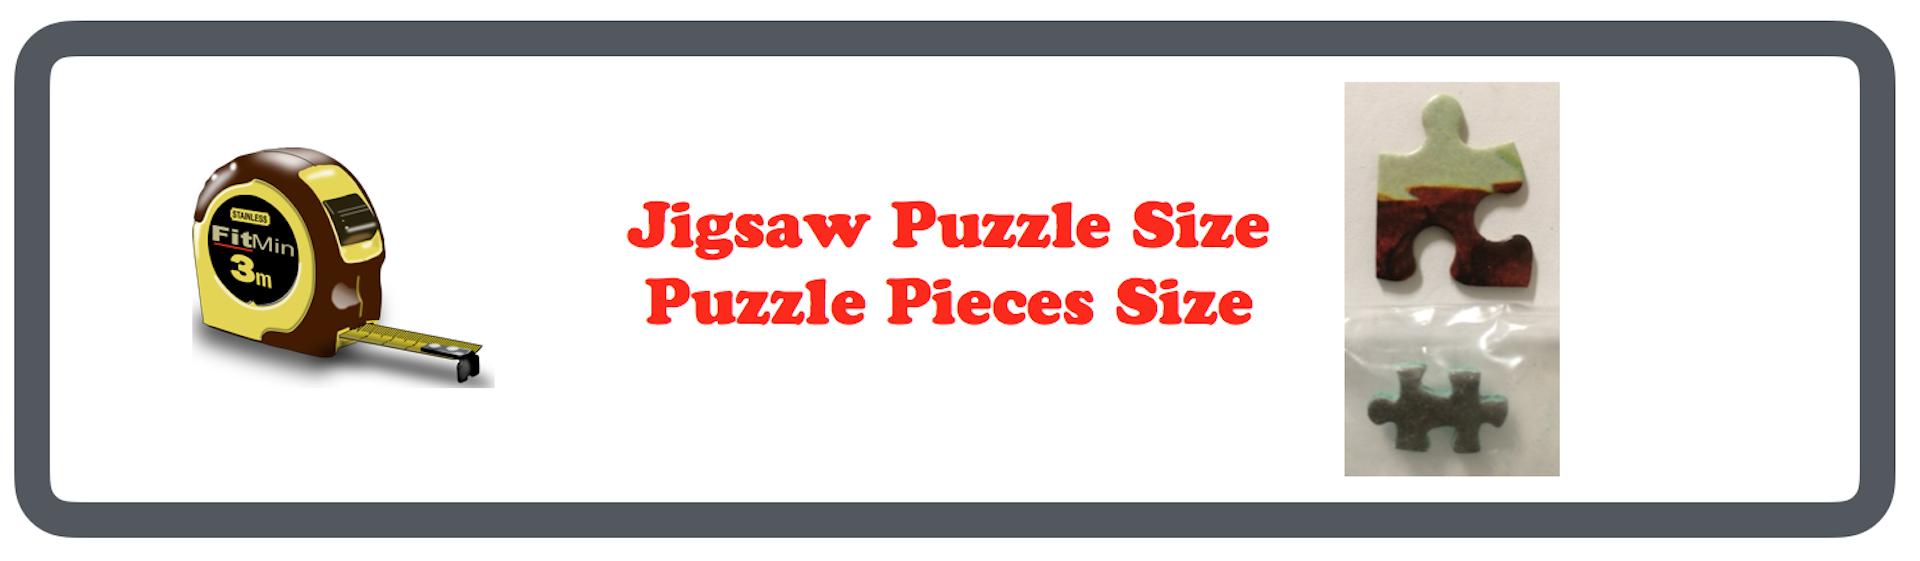 jigsaw-puzzle-size